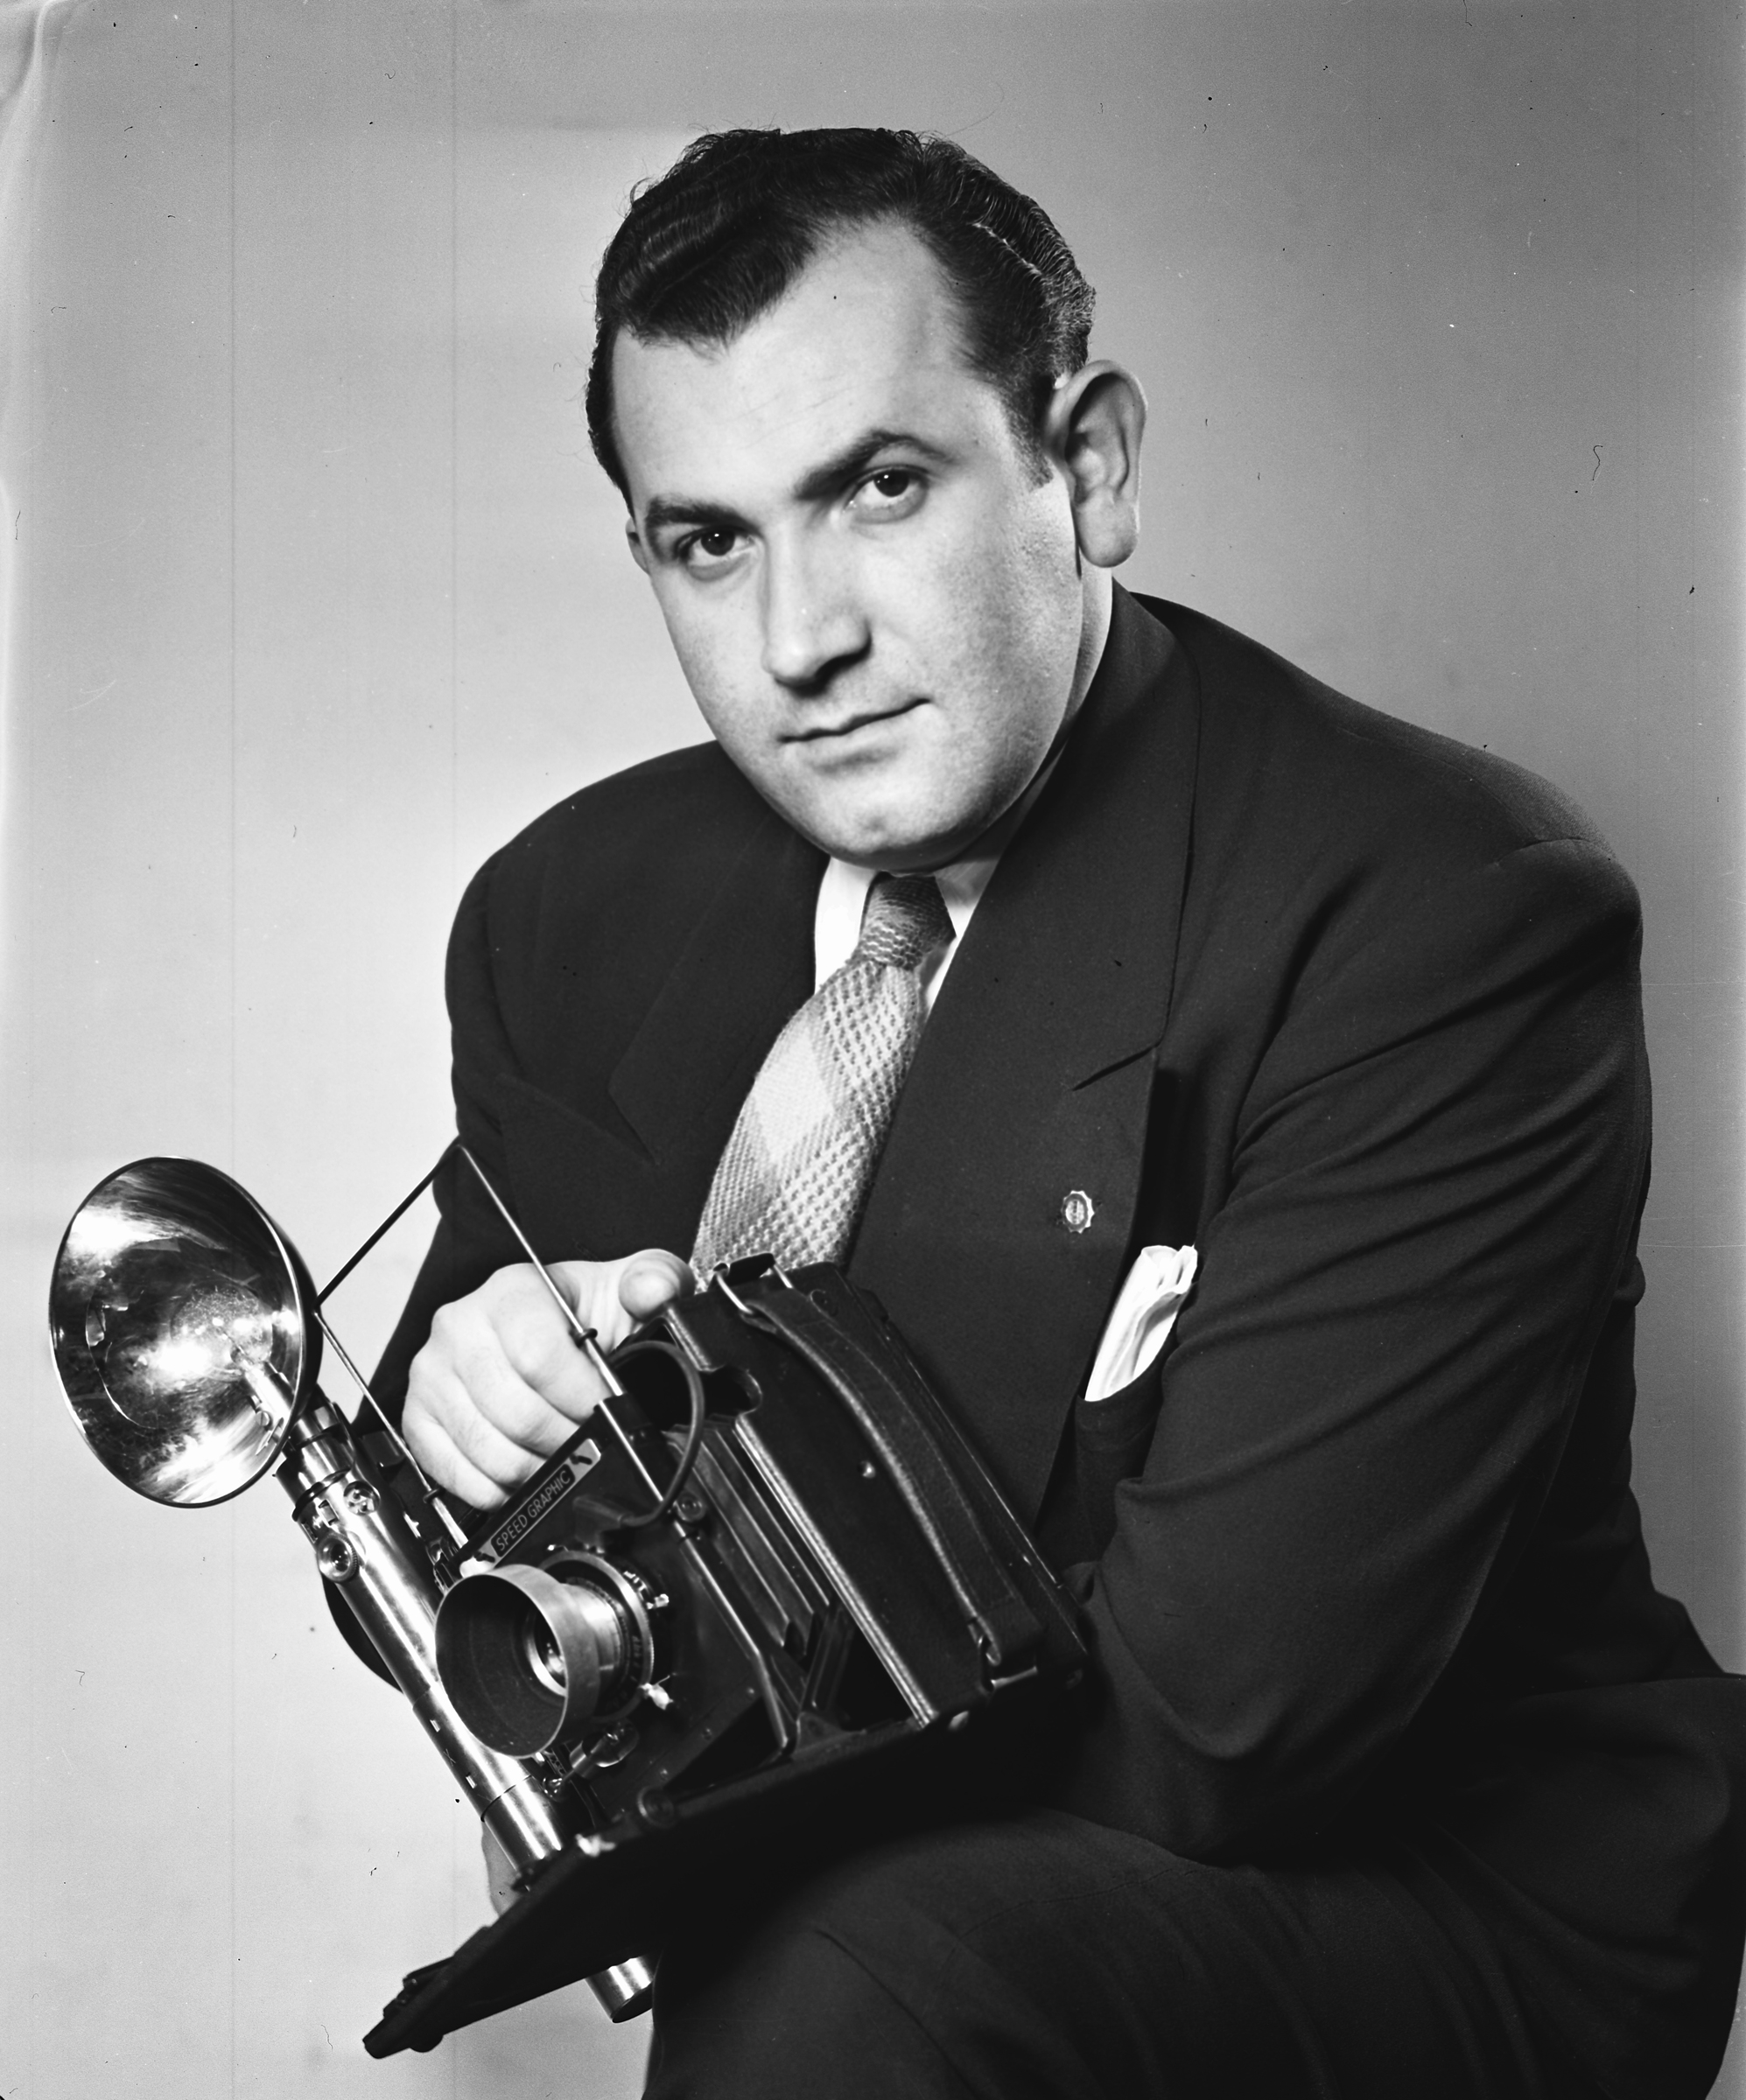 Irving Haberman (1916-2003)